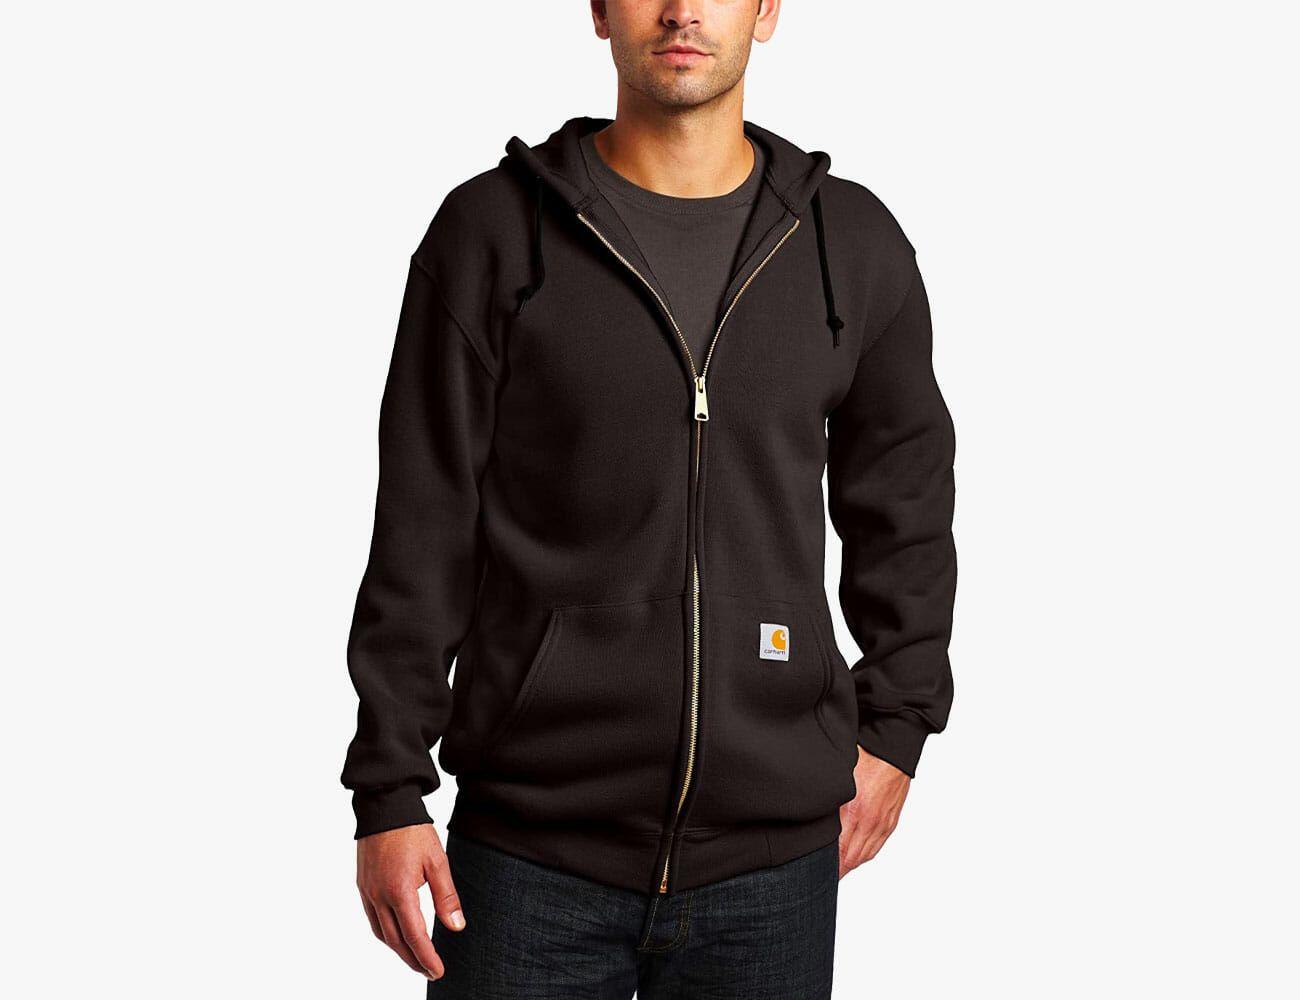 Mens Classic Pullover Hoodie Sweatshirt,Live My Best Life Print